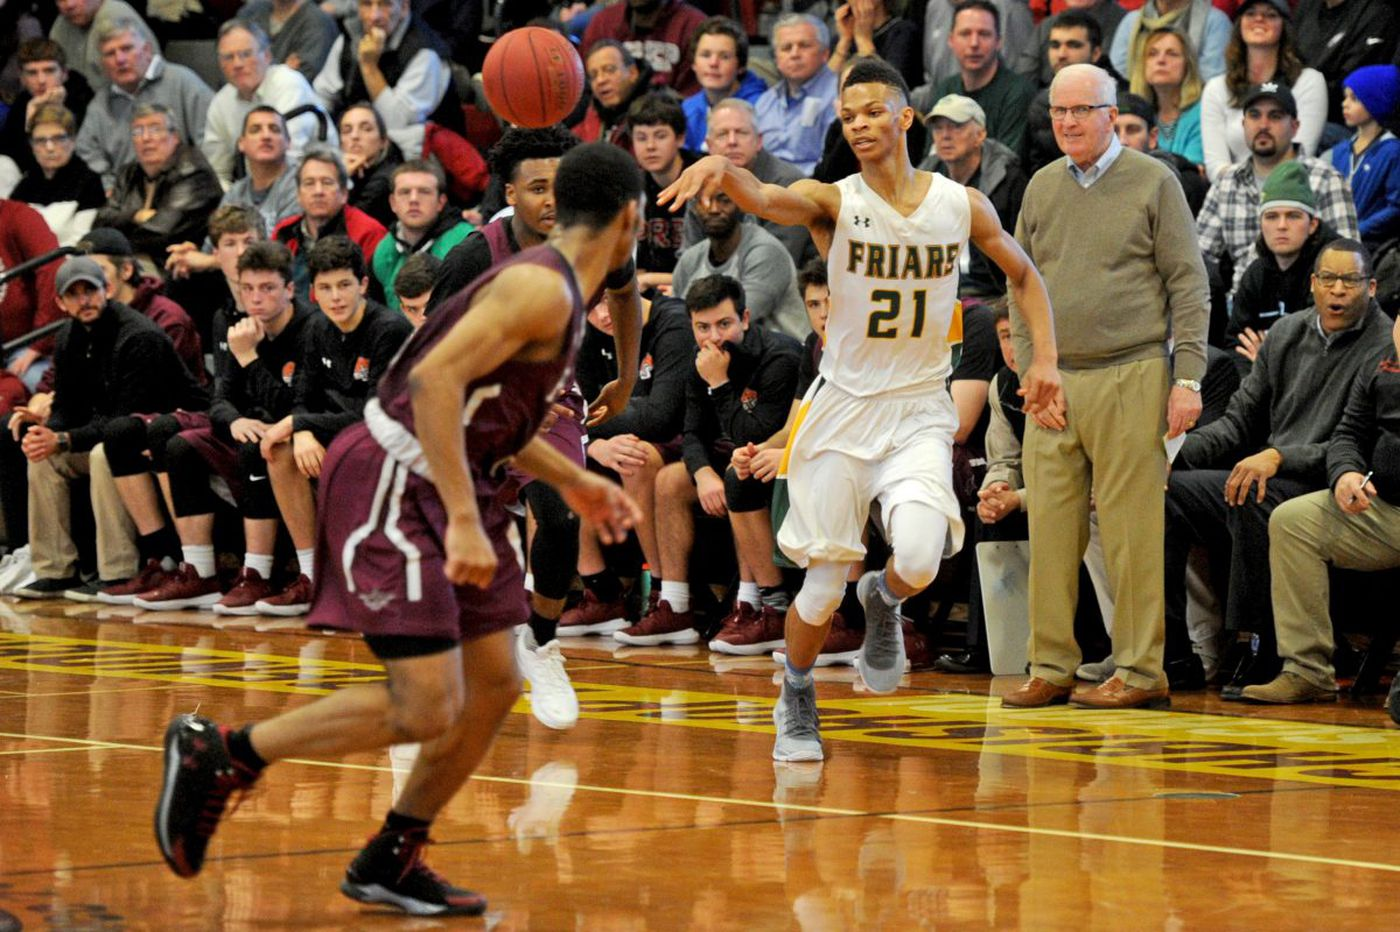 Sunday's Pa. roundup: Bonner-Prendergast boys' basketball clips West Catholic behind Isaiah Wong's heroics